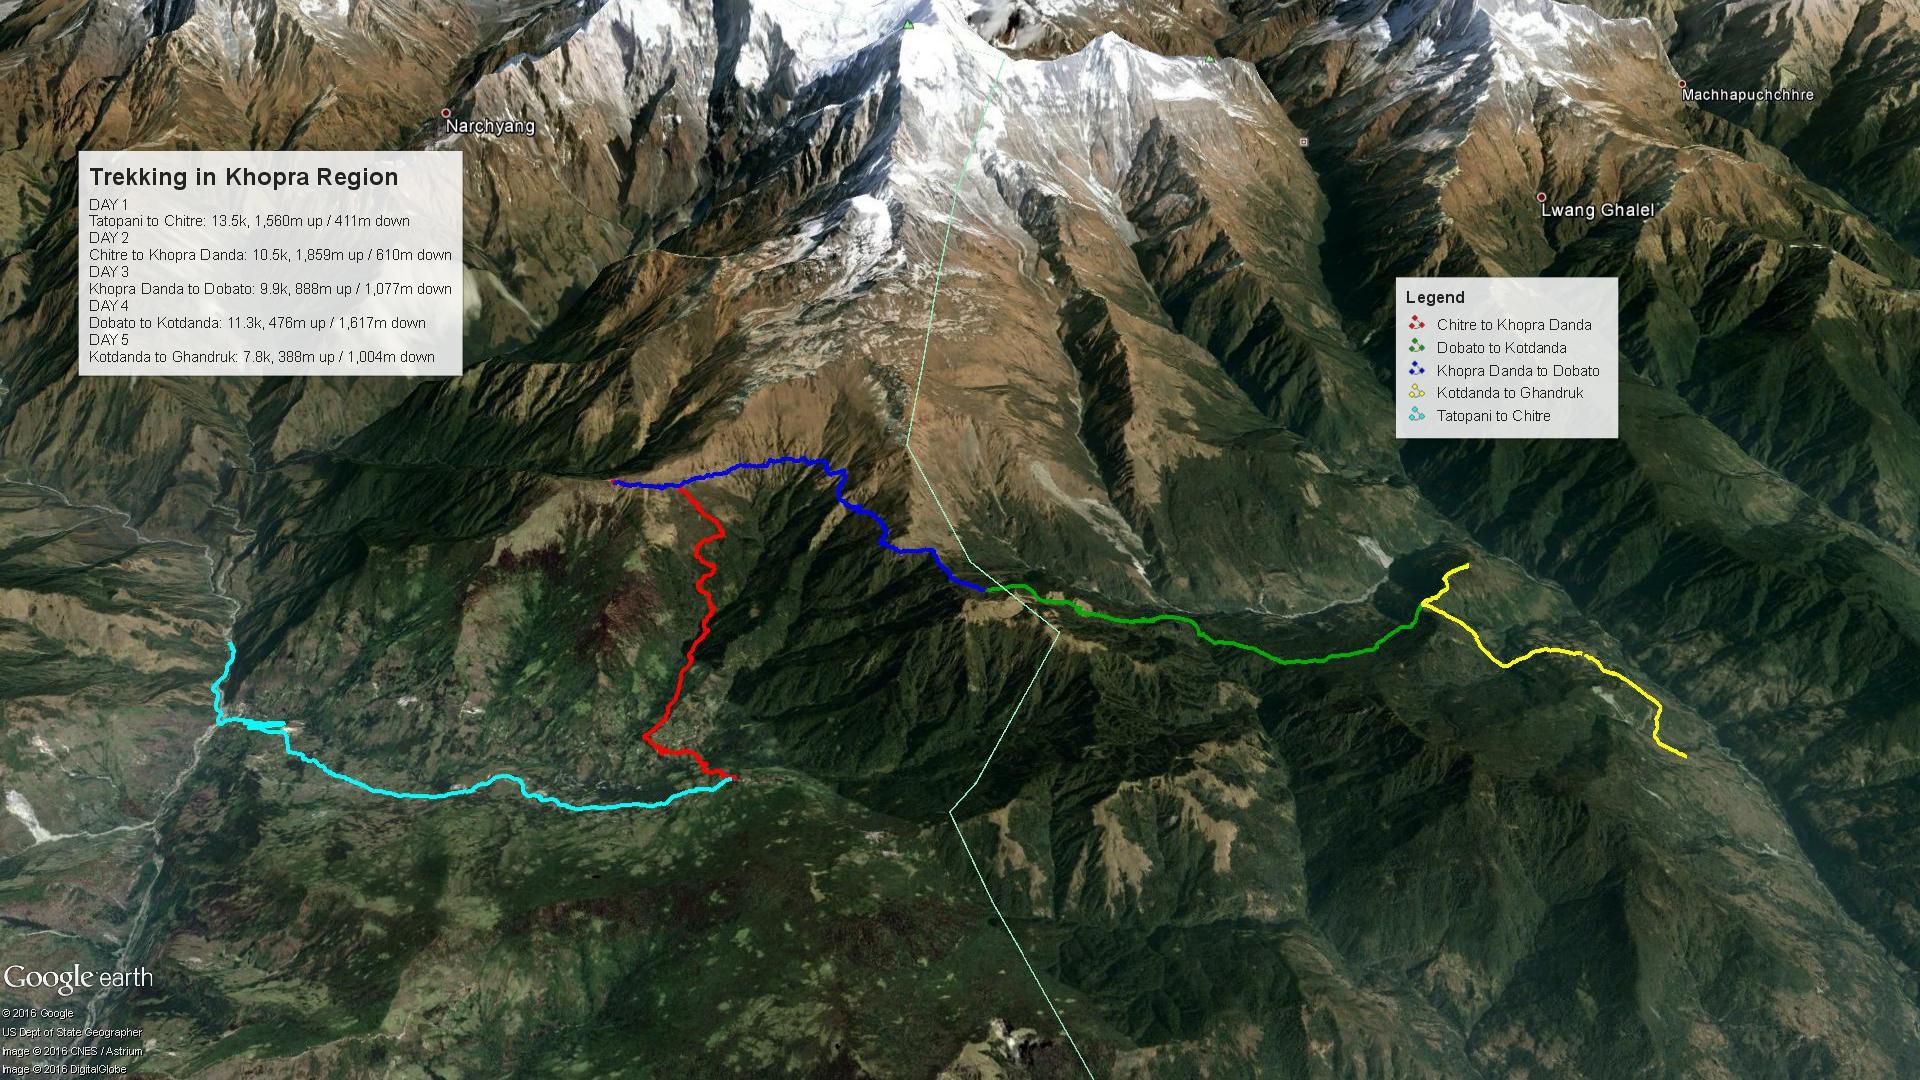 Khopra Region Trekking Map